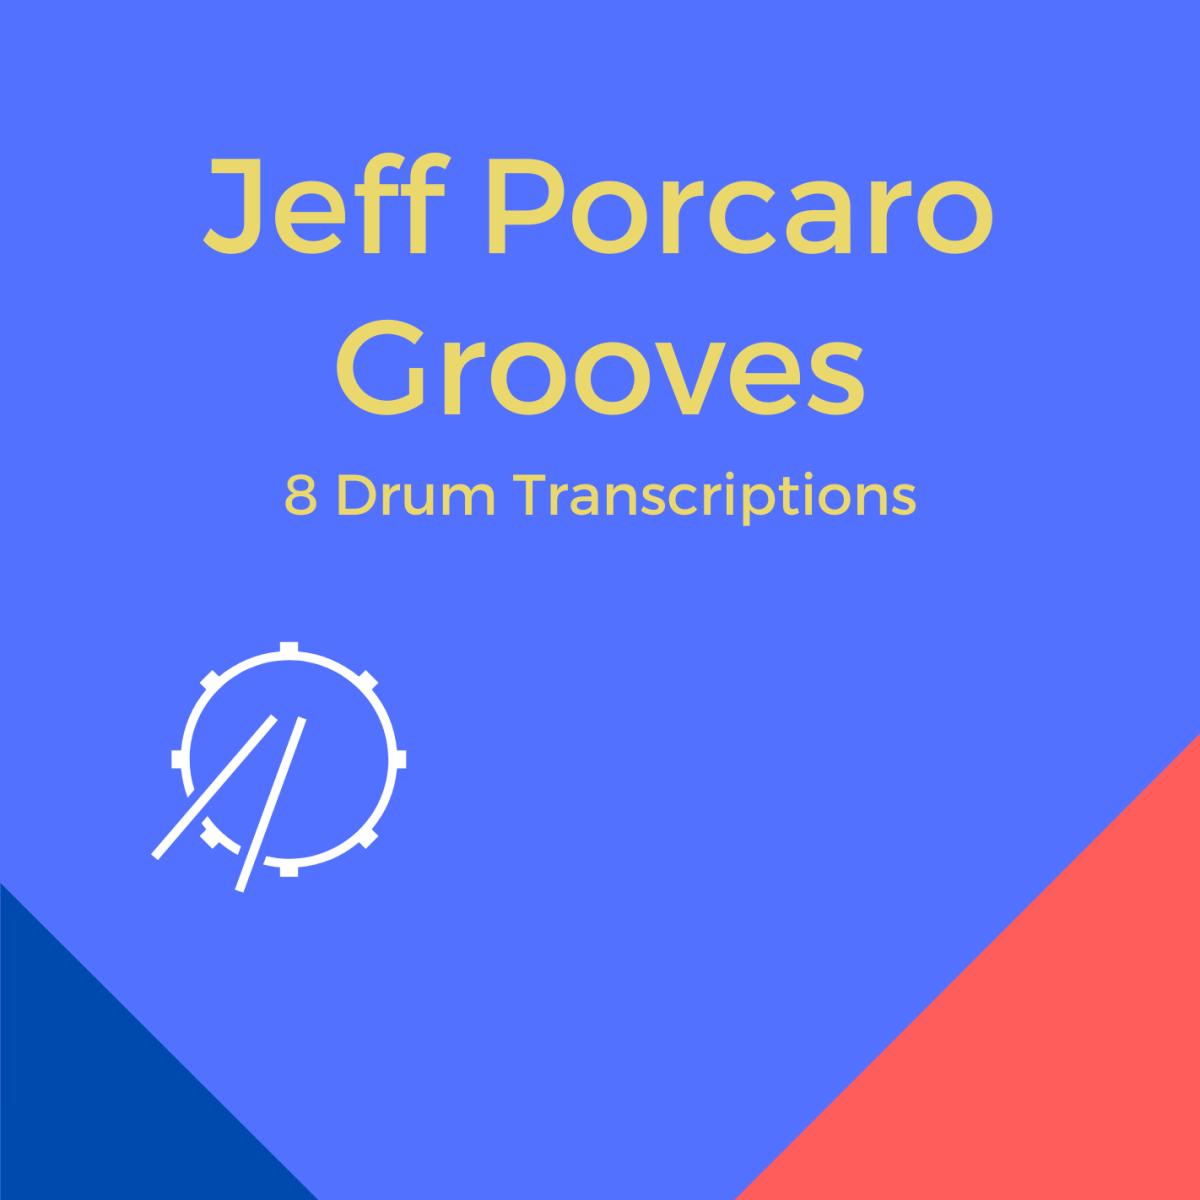 jeff porcaro grooves drum transcriptions